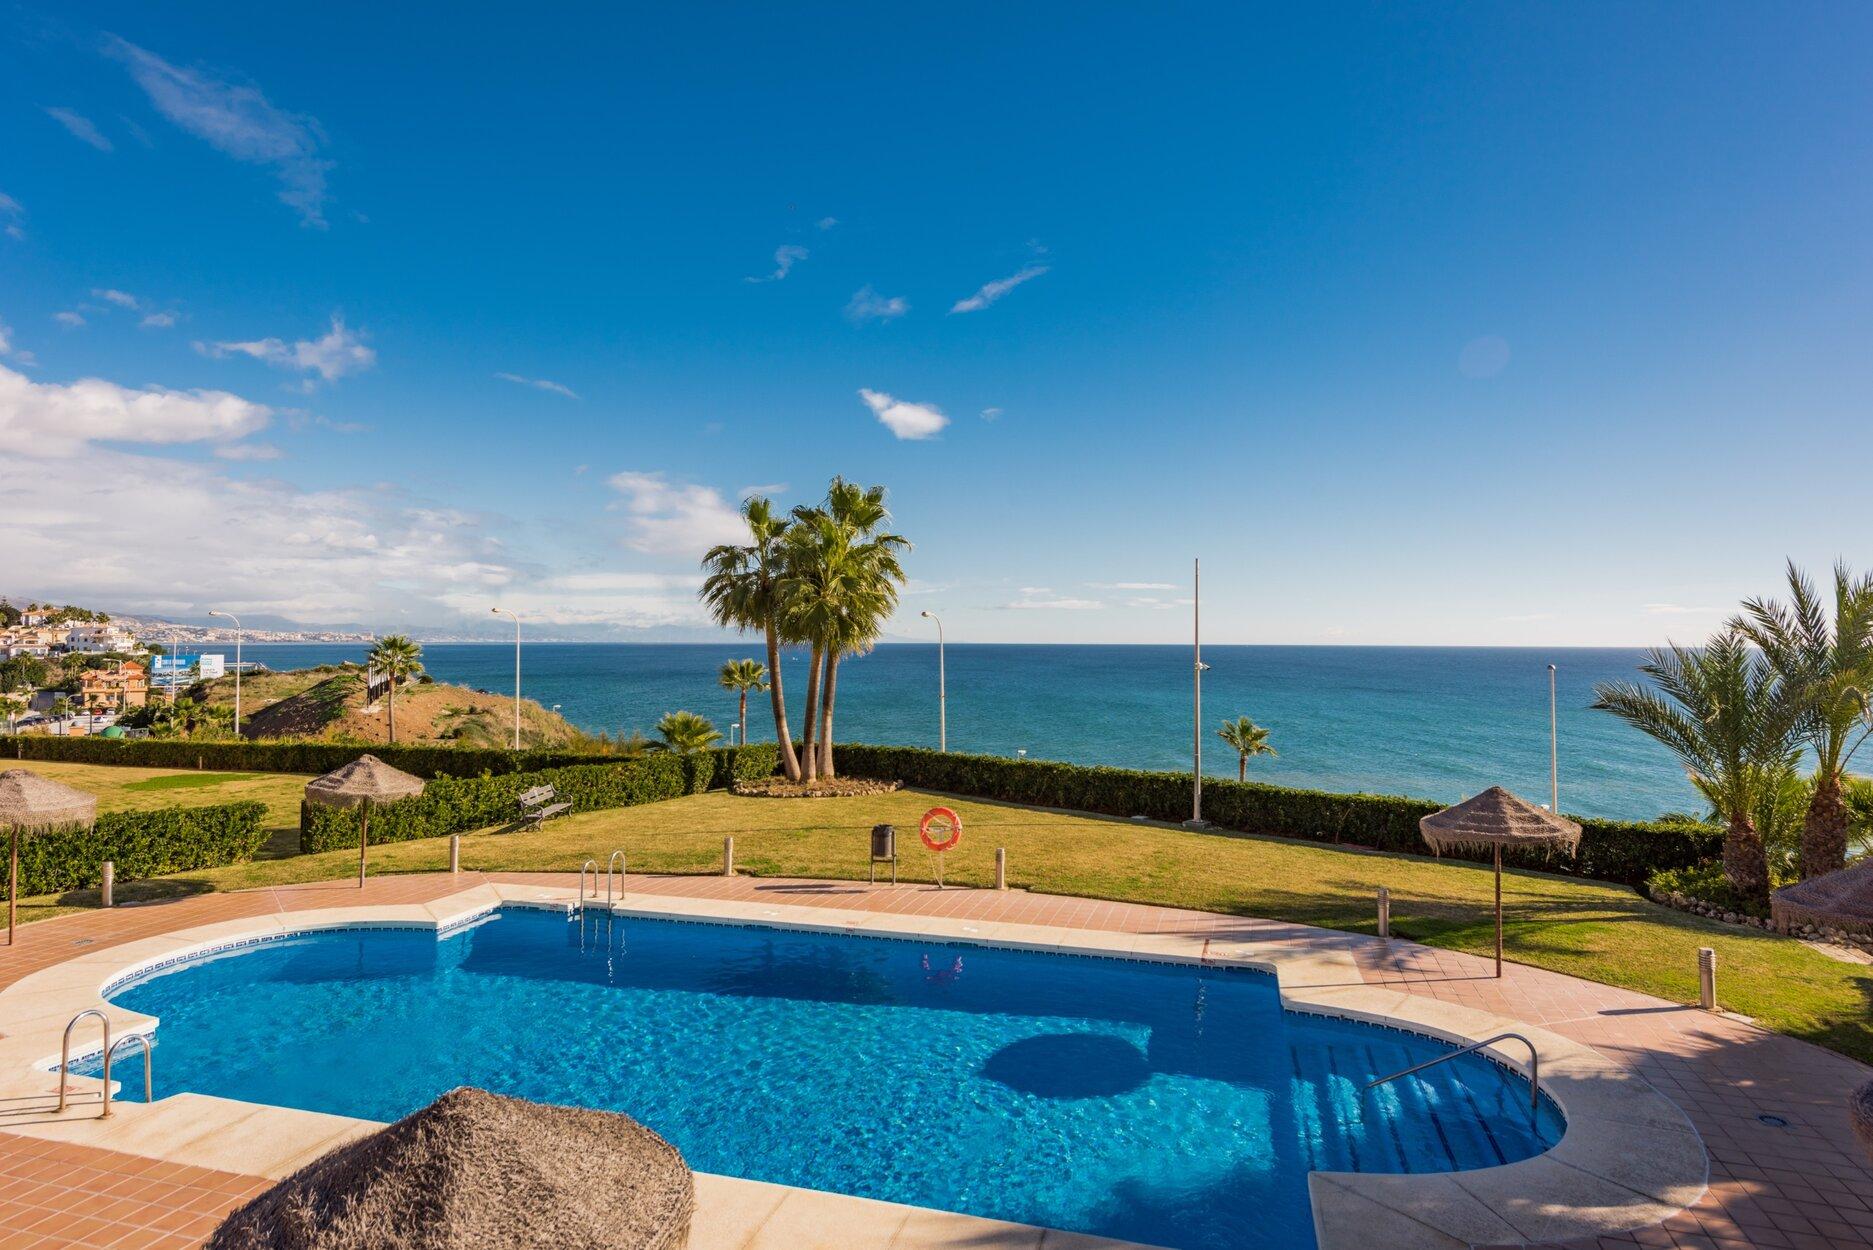 Apartment for sale in Mijas, El Faro